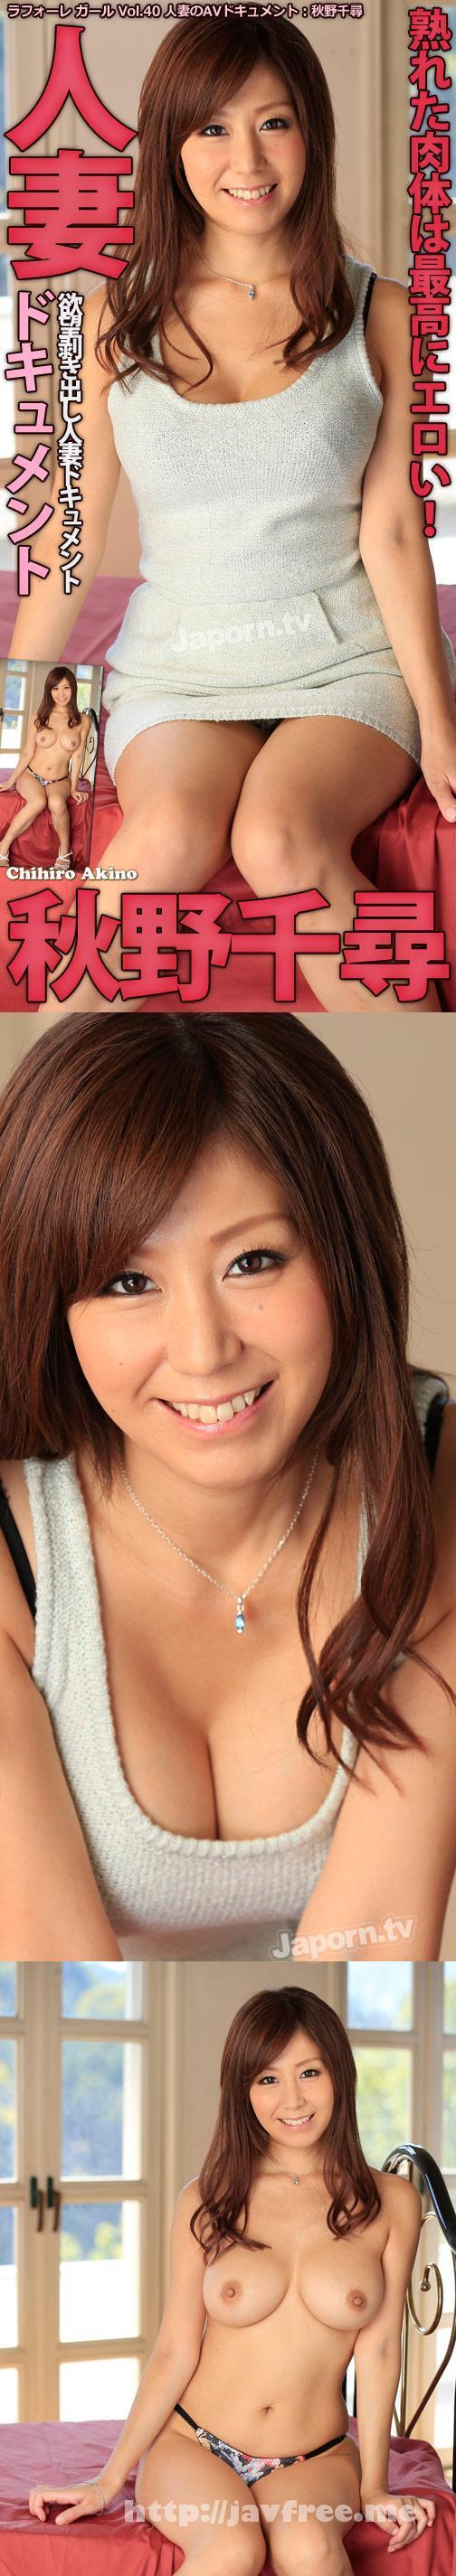 [LAF 40] ラフォーレ ガール Vol.40 人妻のAVドキュメント : 秋野千尋 秋野千尋 LAF Chihiro Akino